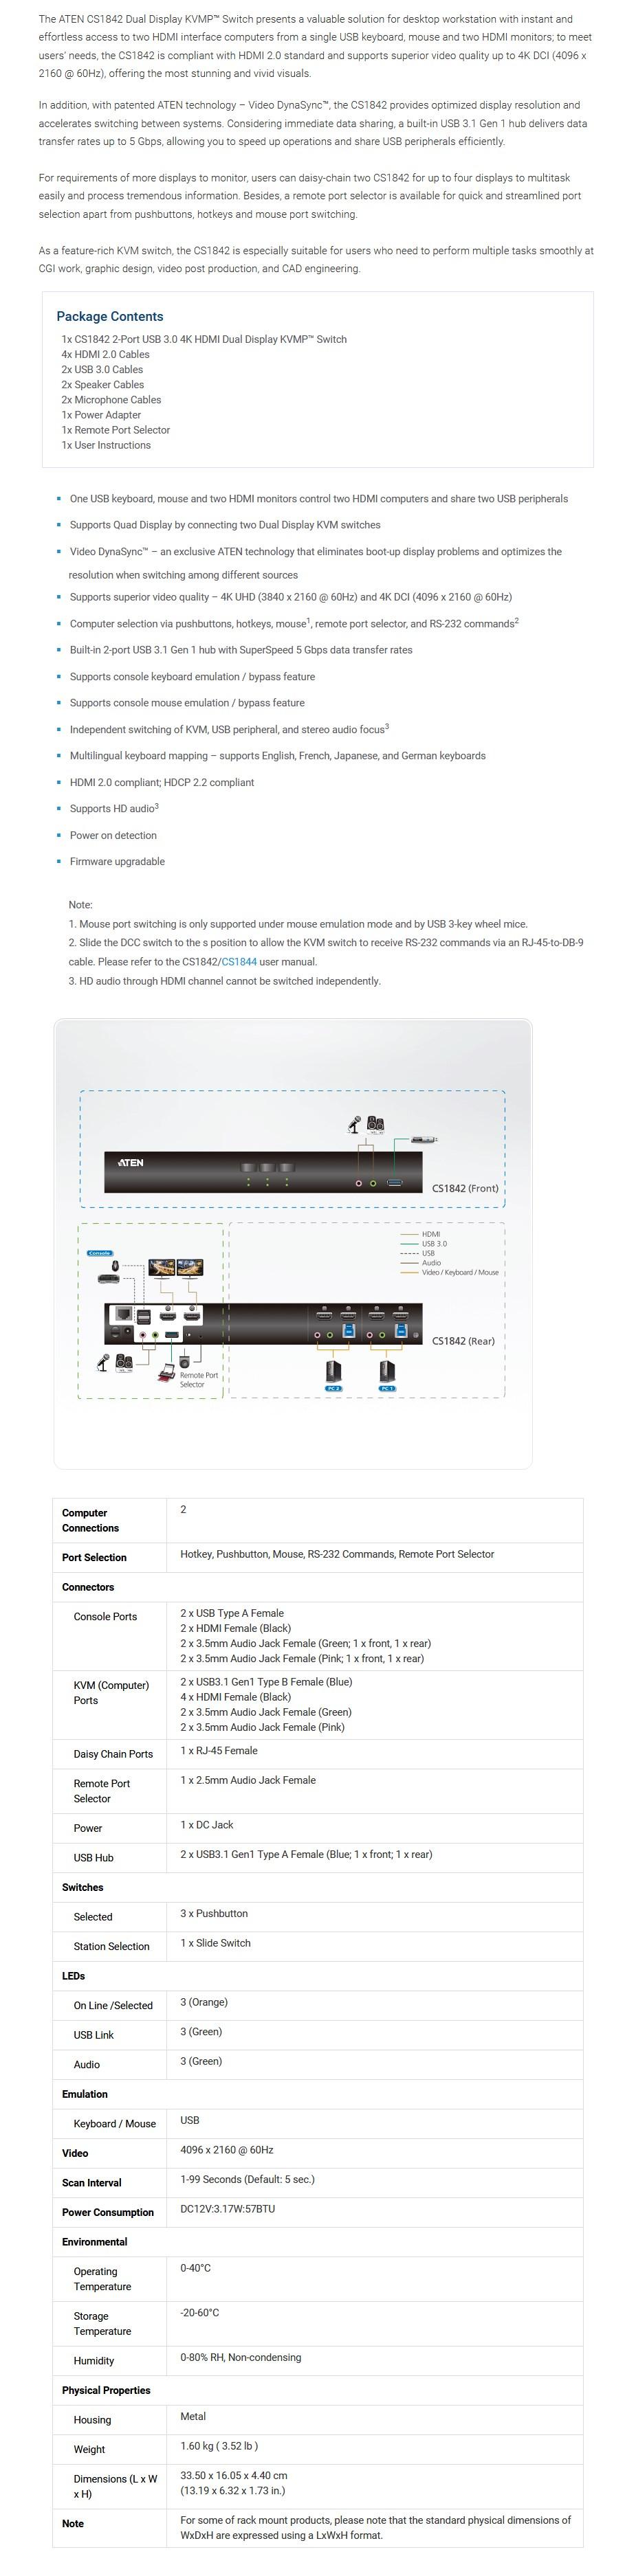 Aten CS1842 2-Port USB3.0 4K HDMI Dual Display KVMP Switch - Overview 1